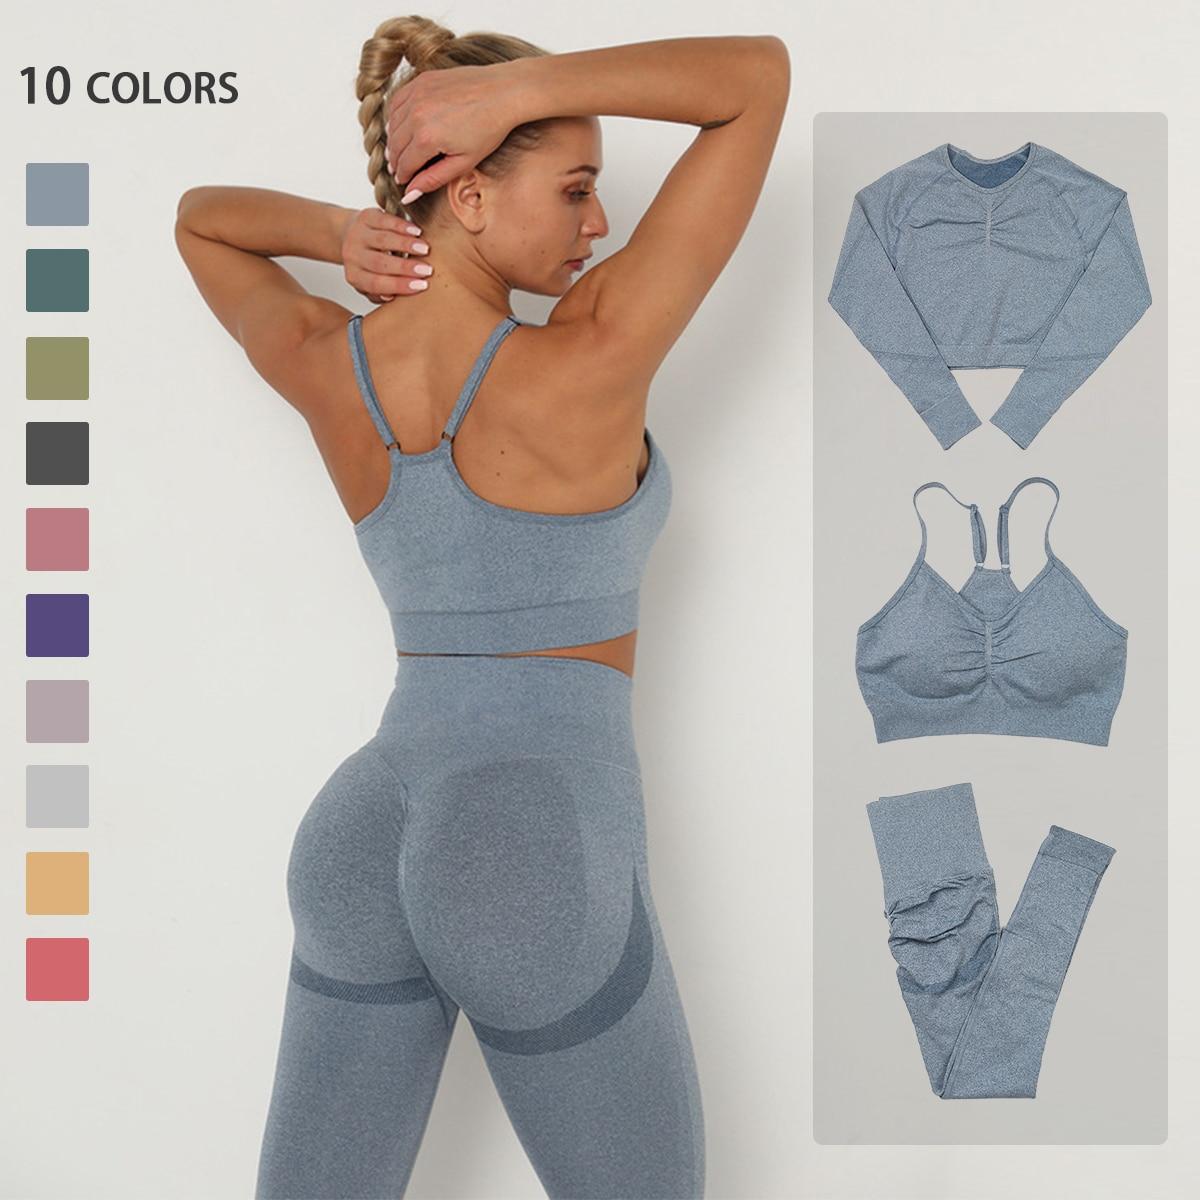 Seamless Yoga Set Women Workout Sportswear Gym Clothing Fitness Long Sleeve Crop Top High Waist Leggings+ Bra Sports Suits